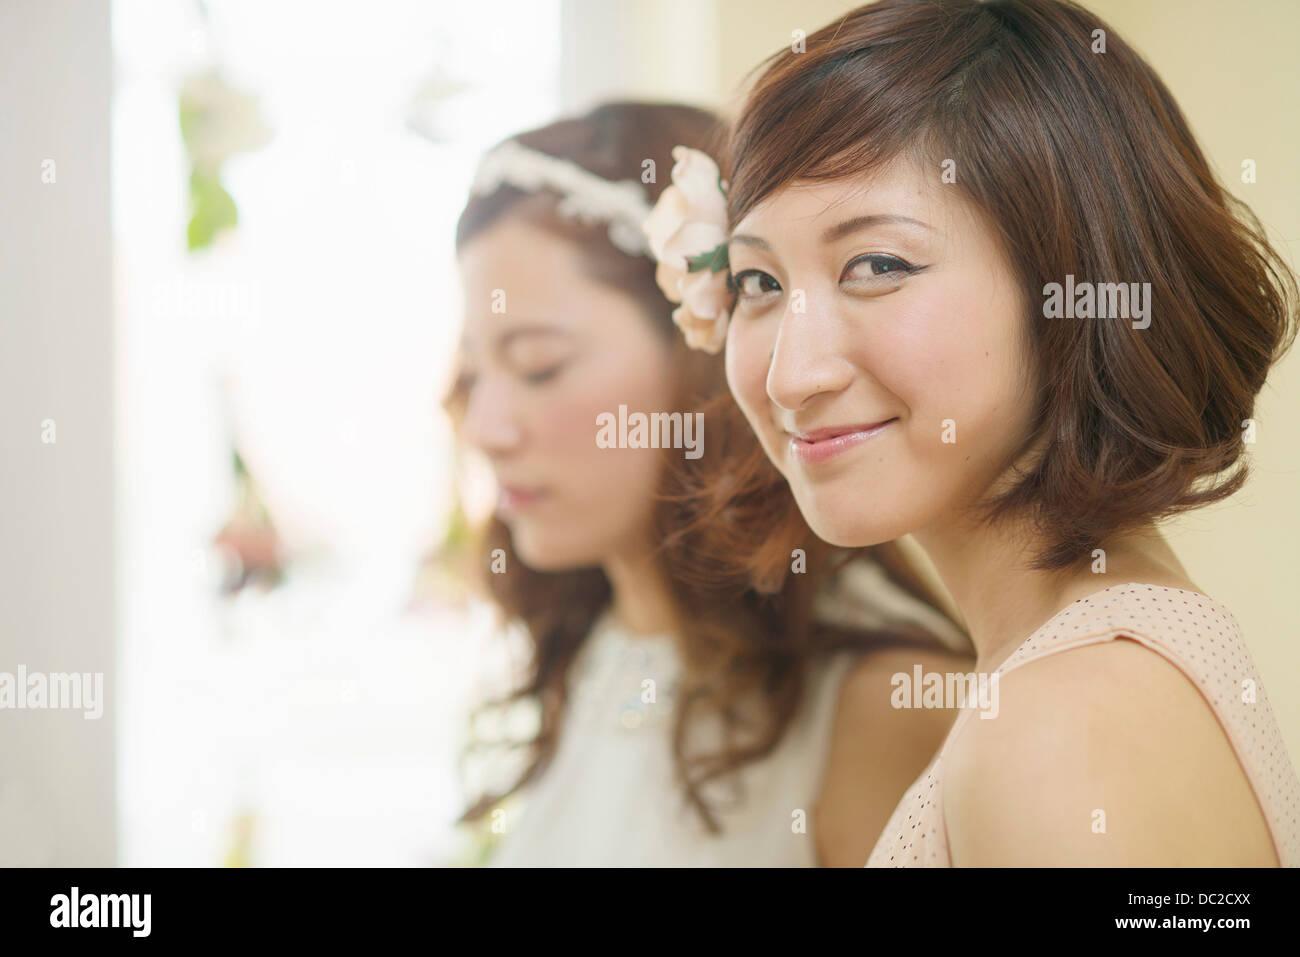 Woman smiling looking sideways at camera - Stock Image